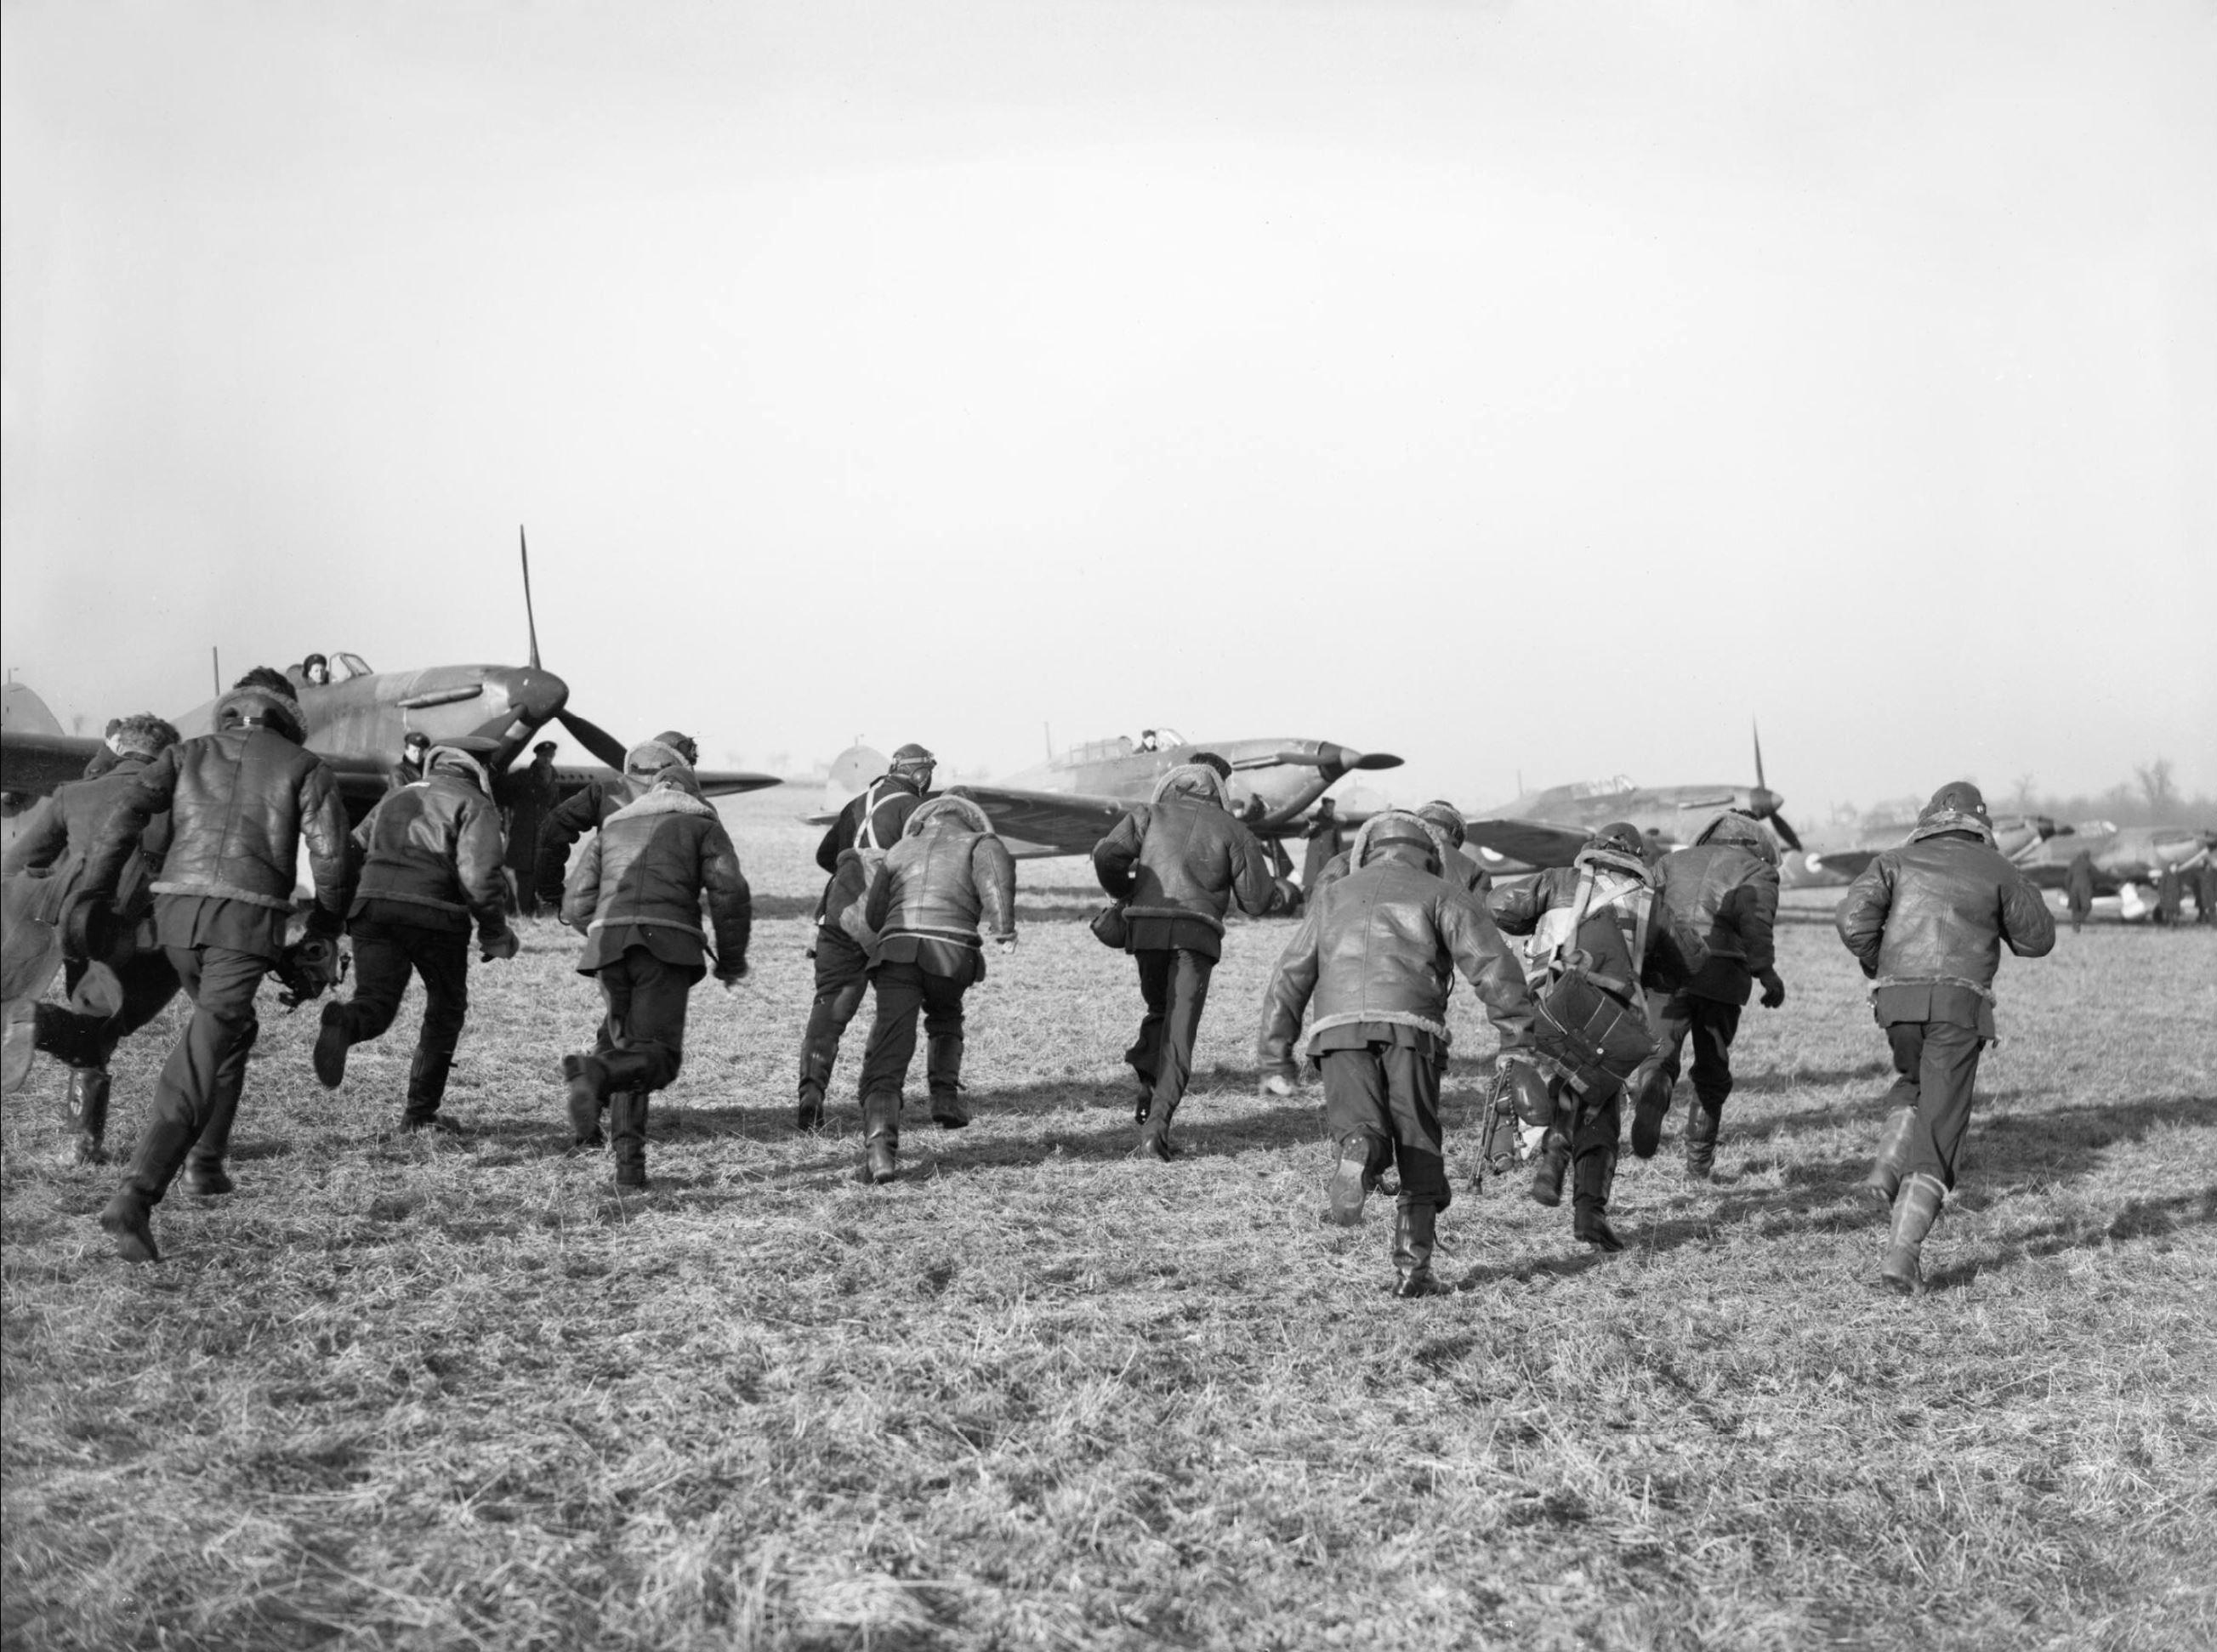 Hurricane I RAF 87Sqn at Lille Seclin Nov 1939 IWM C468